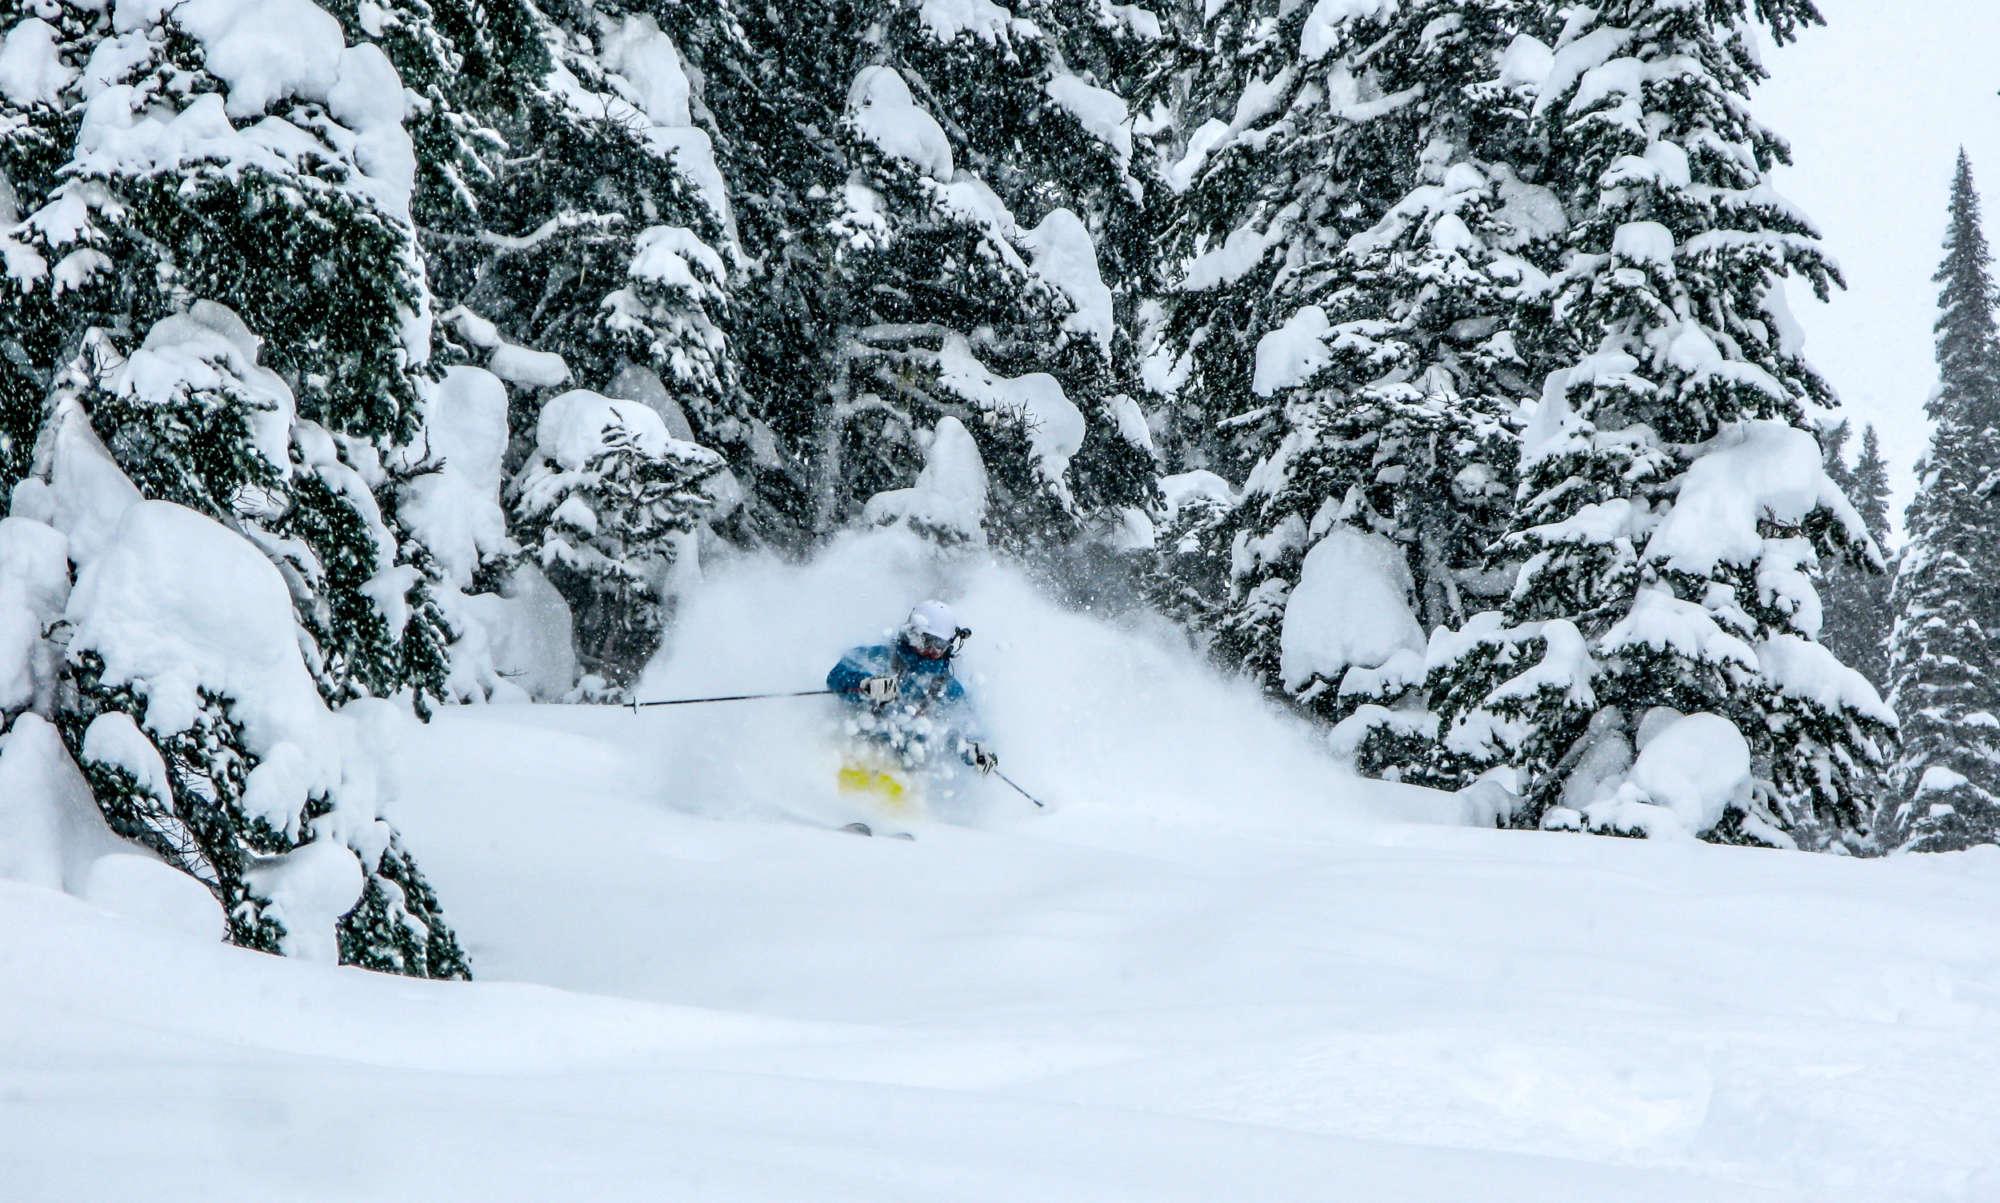 deep BC powder skiing last frontier heli